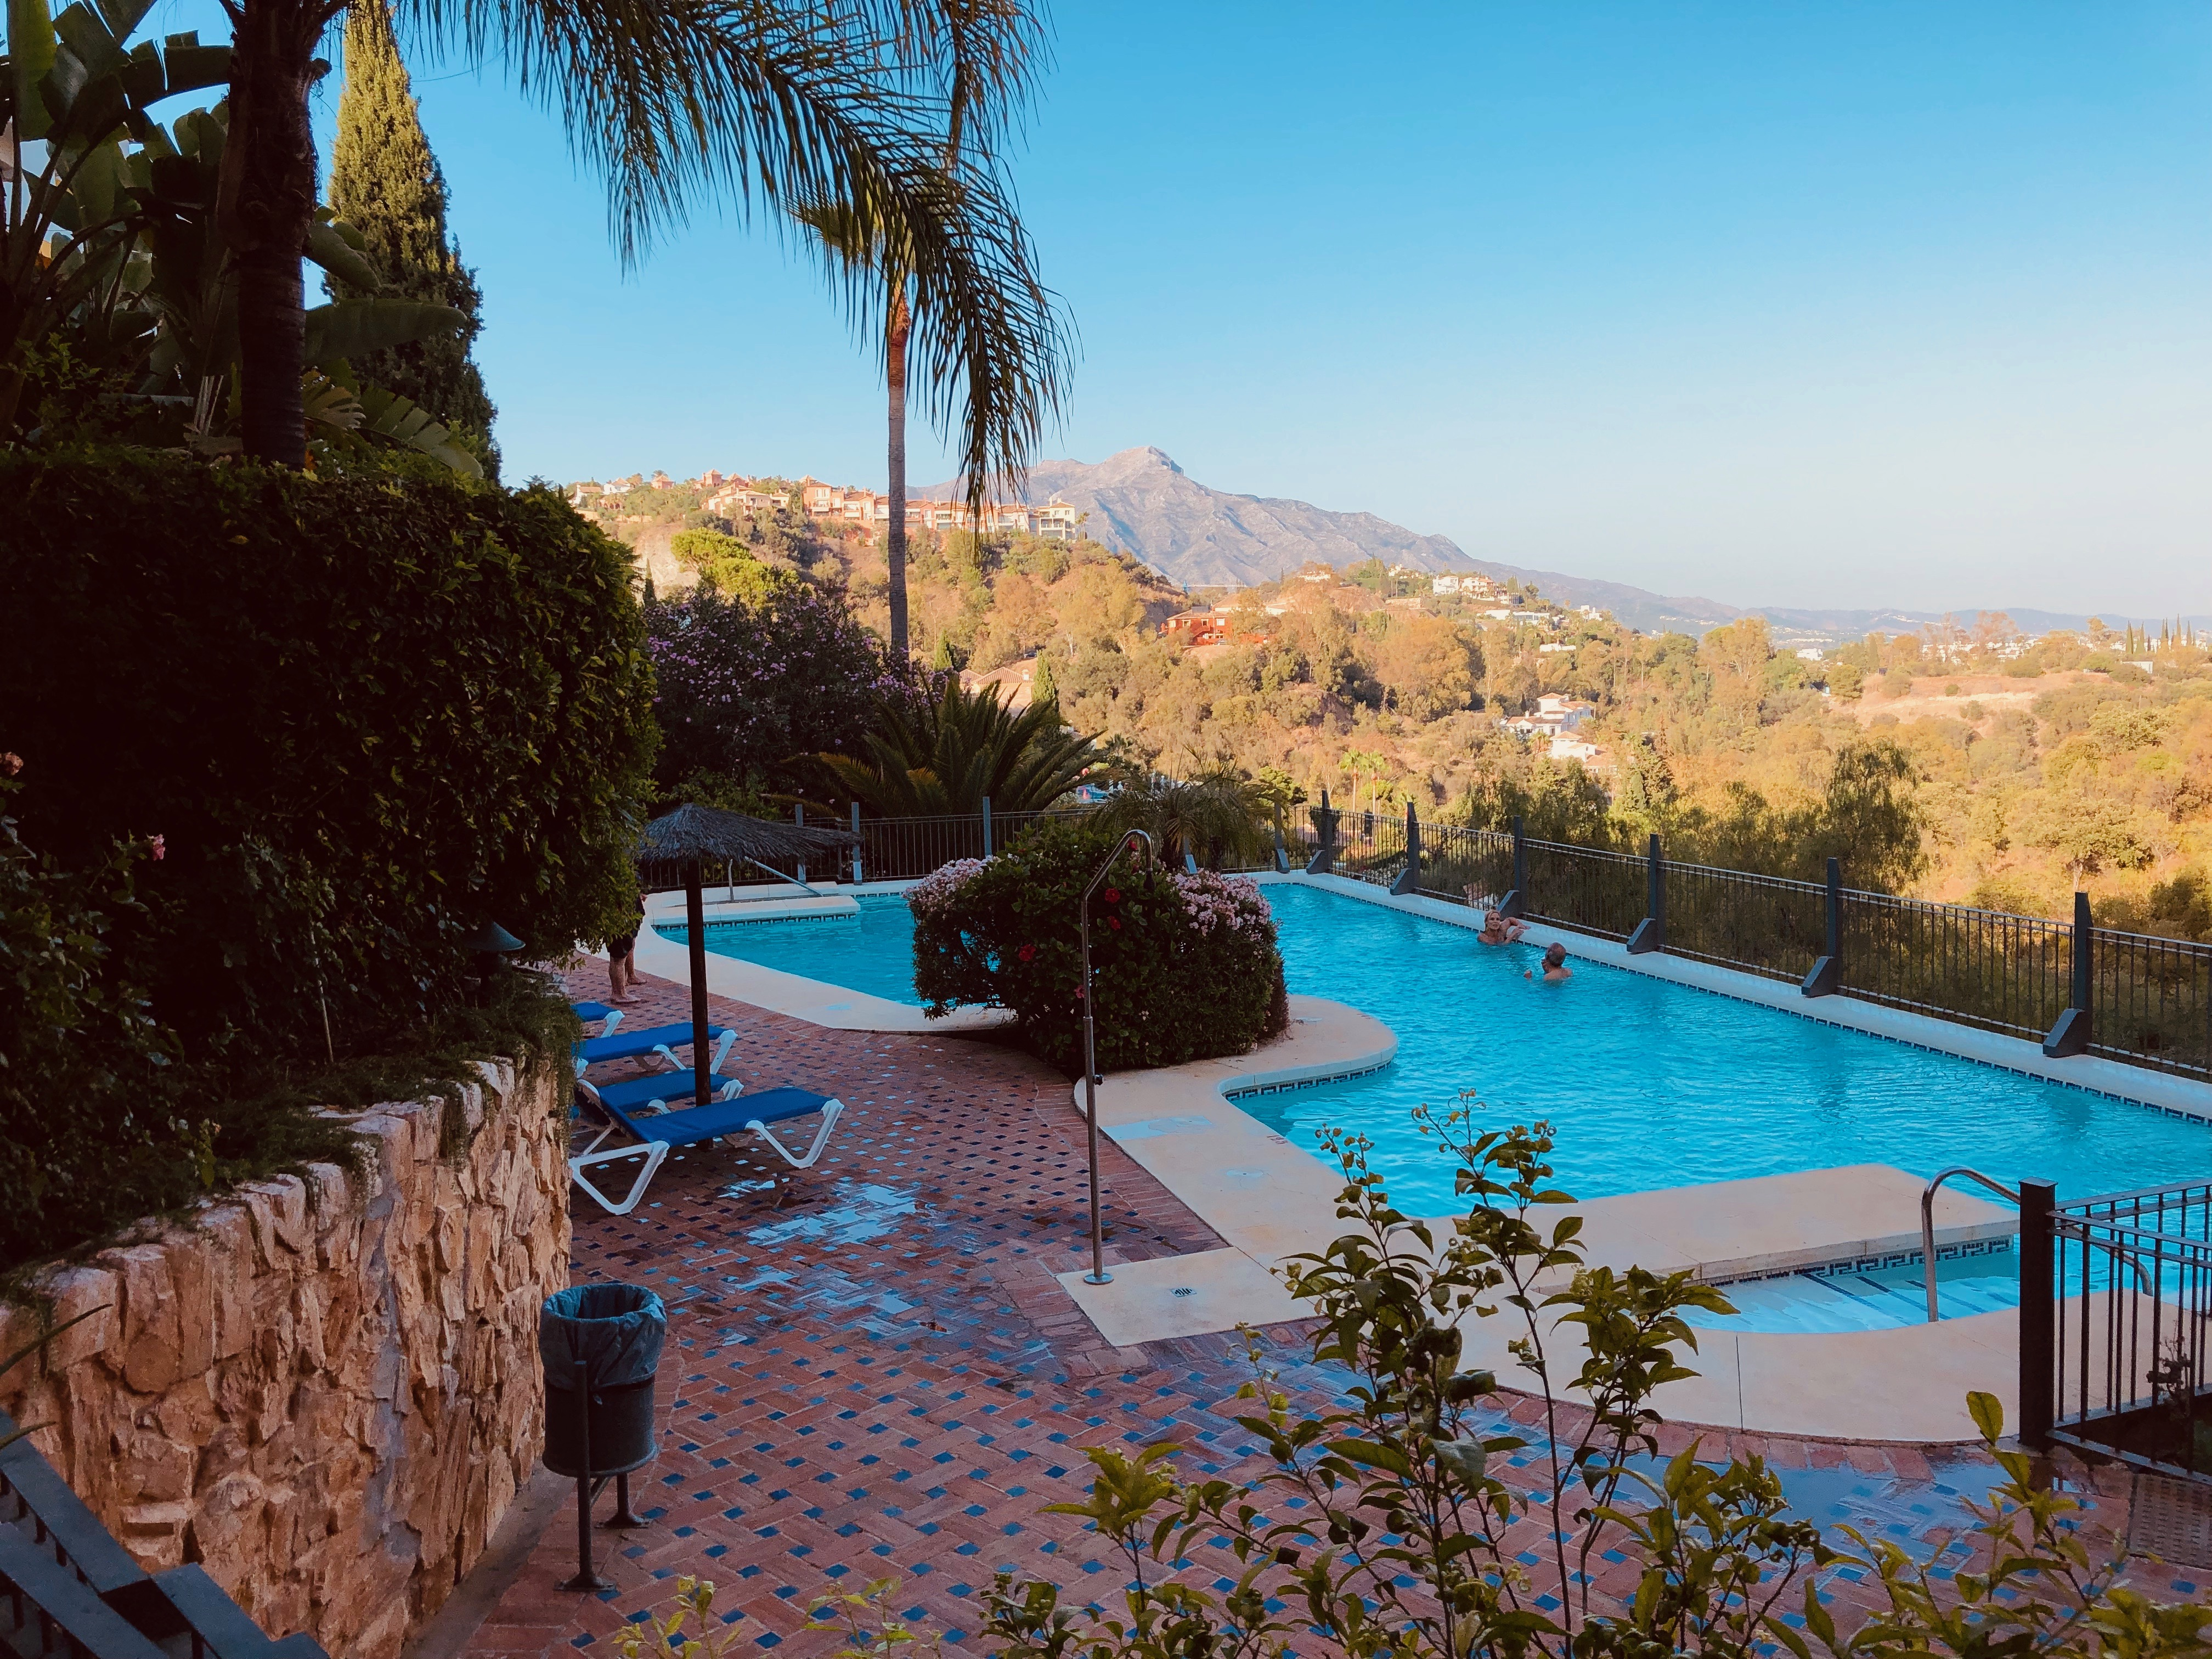 Holiday rental marbella-benahavis